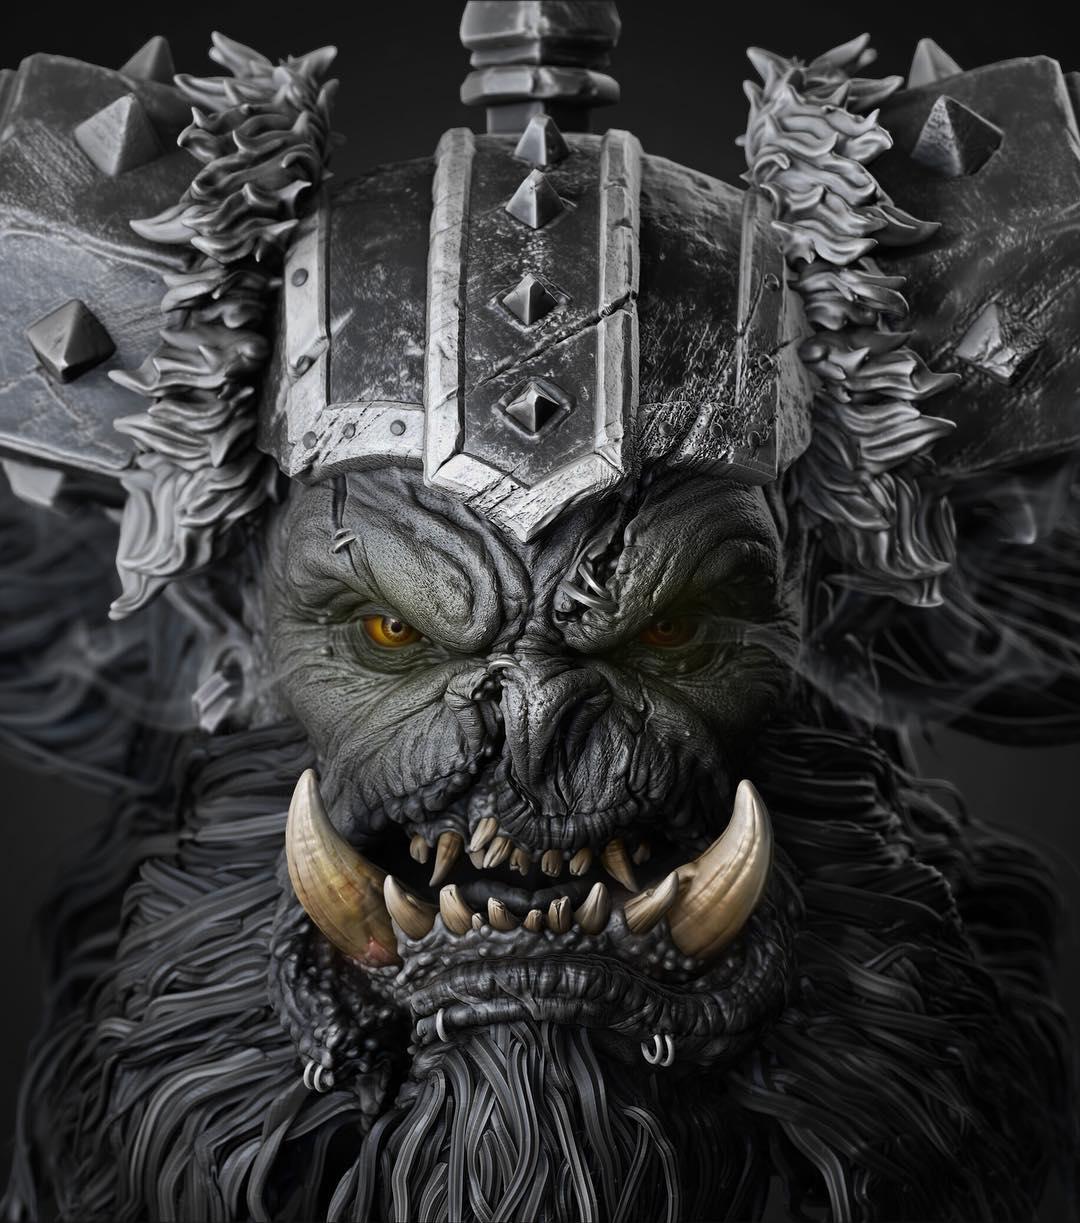 Fan Art Of Warcraft Orc By Gaurav Kumar Cghow